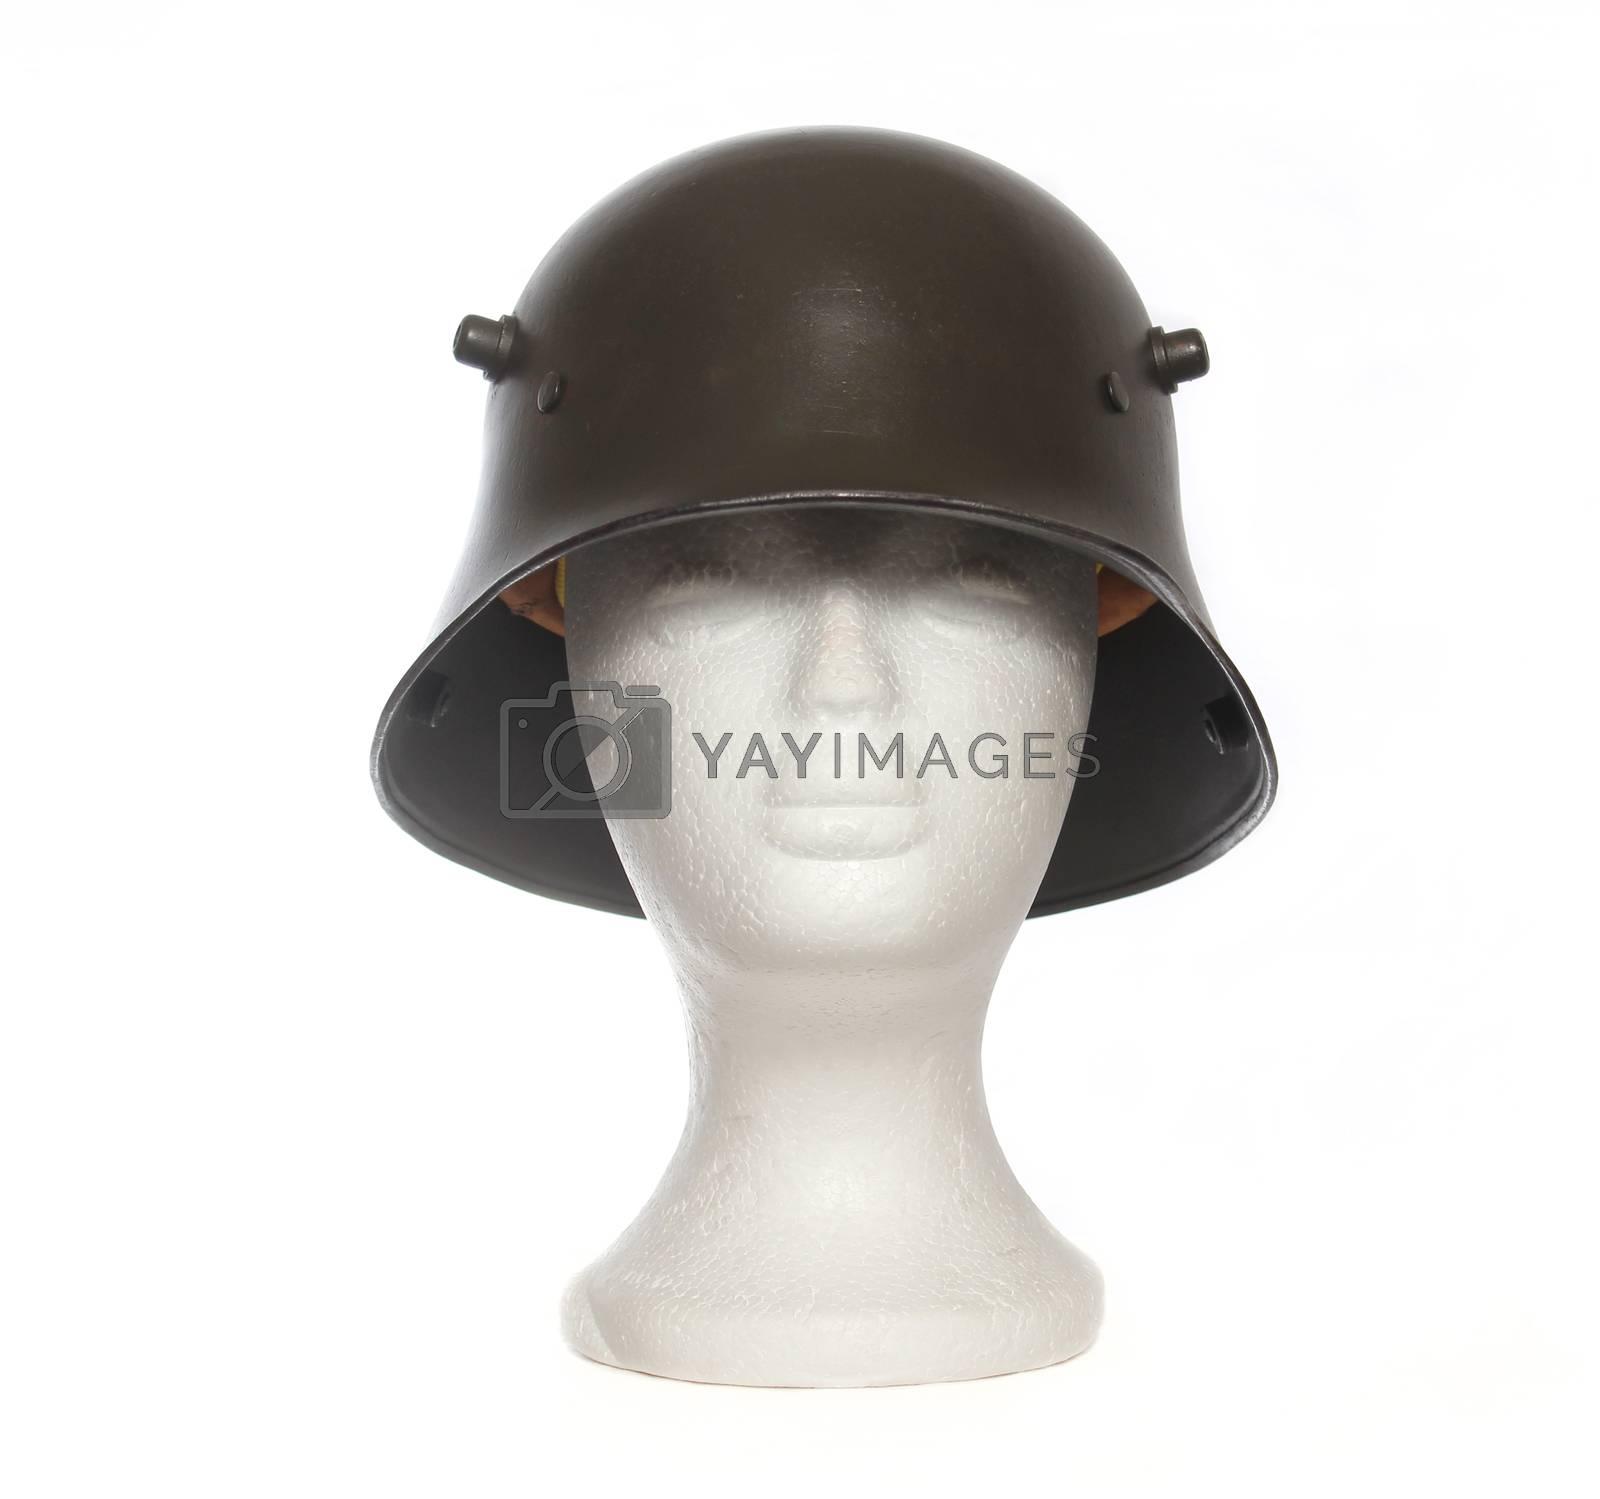 World War 1 German Military Helmet on Mannequin head